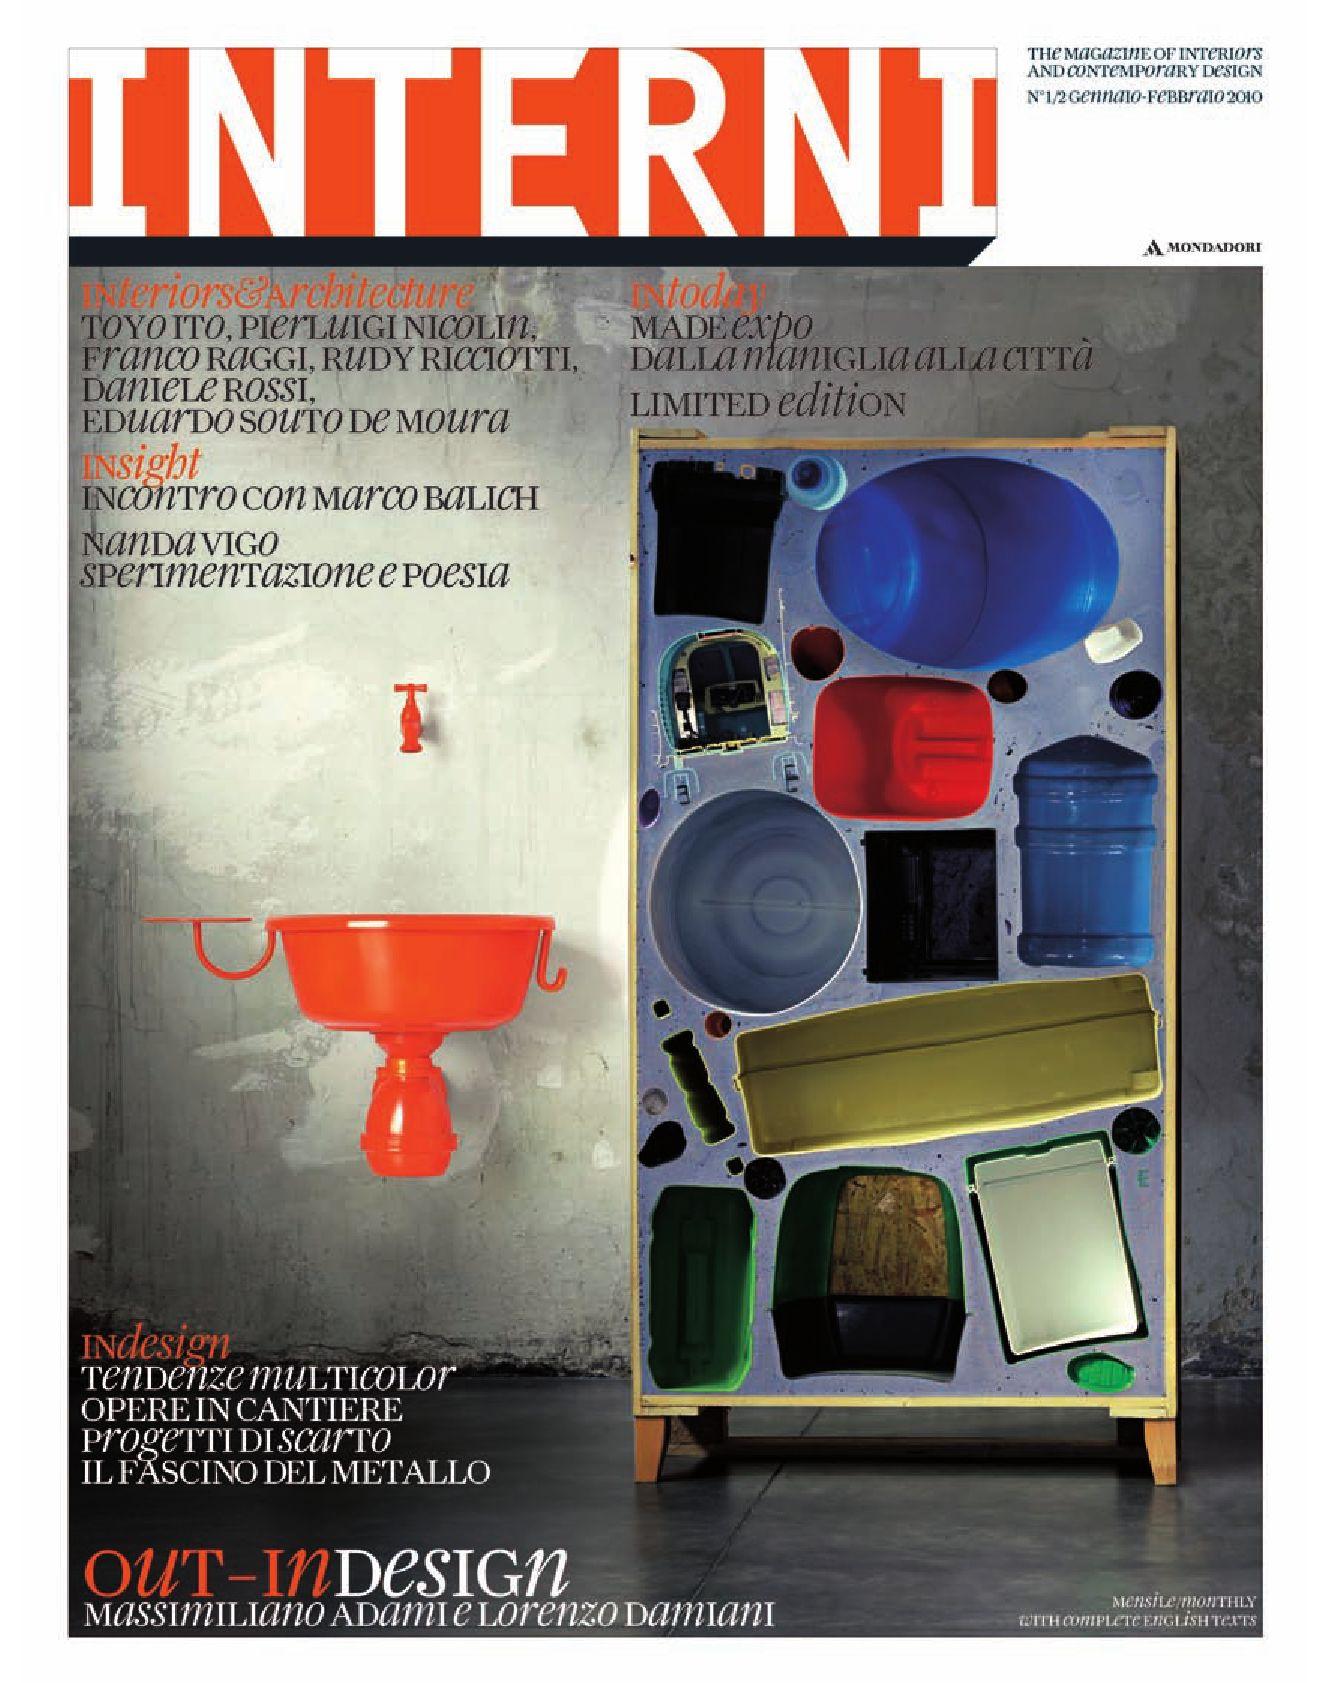 Interni magazine 598 gennaio febbraio 2010 by interni for Rivista interni